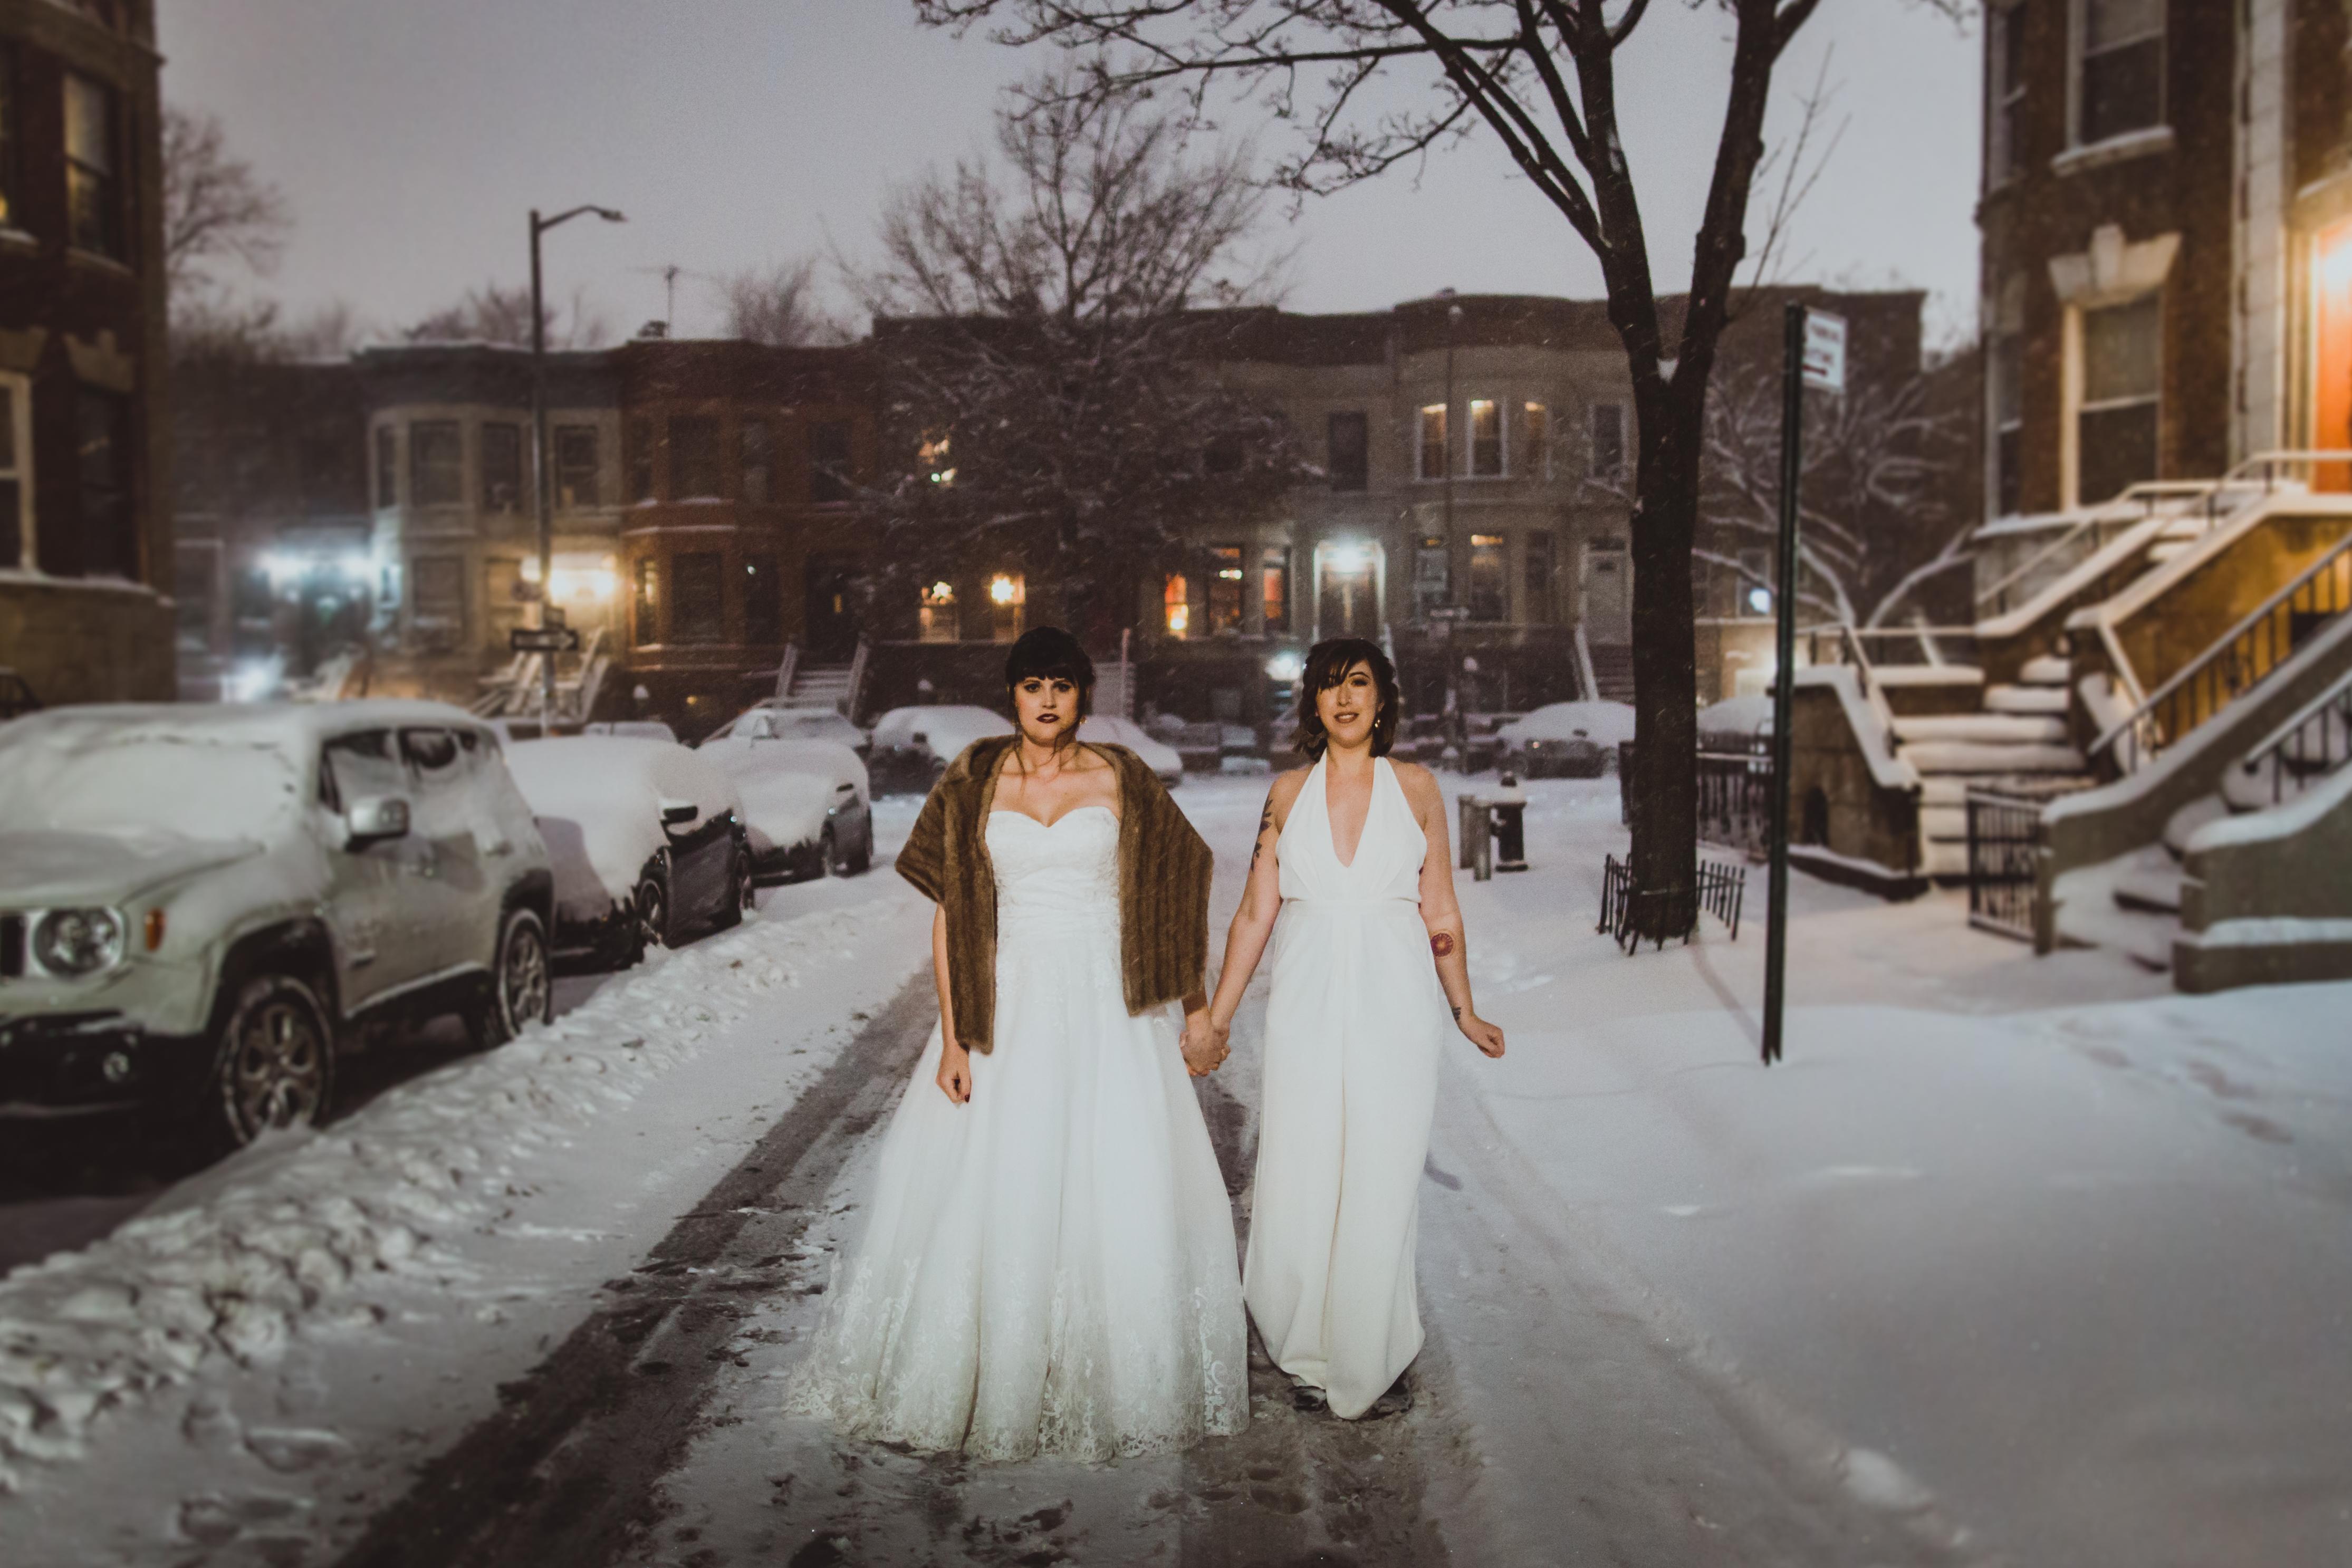 brides on snowy street